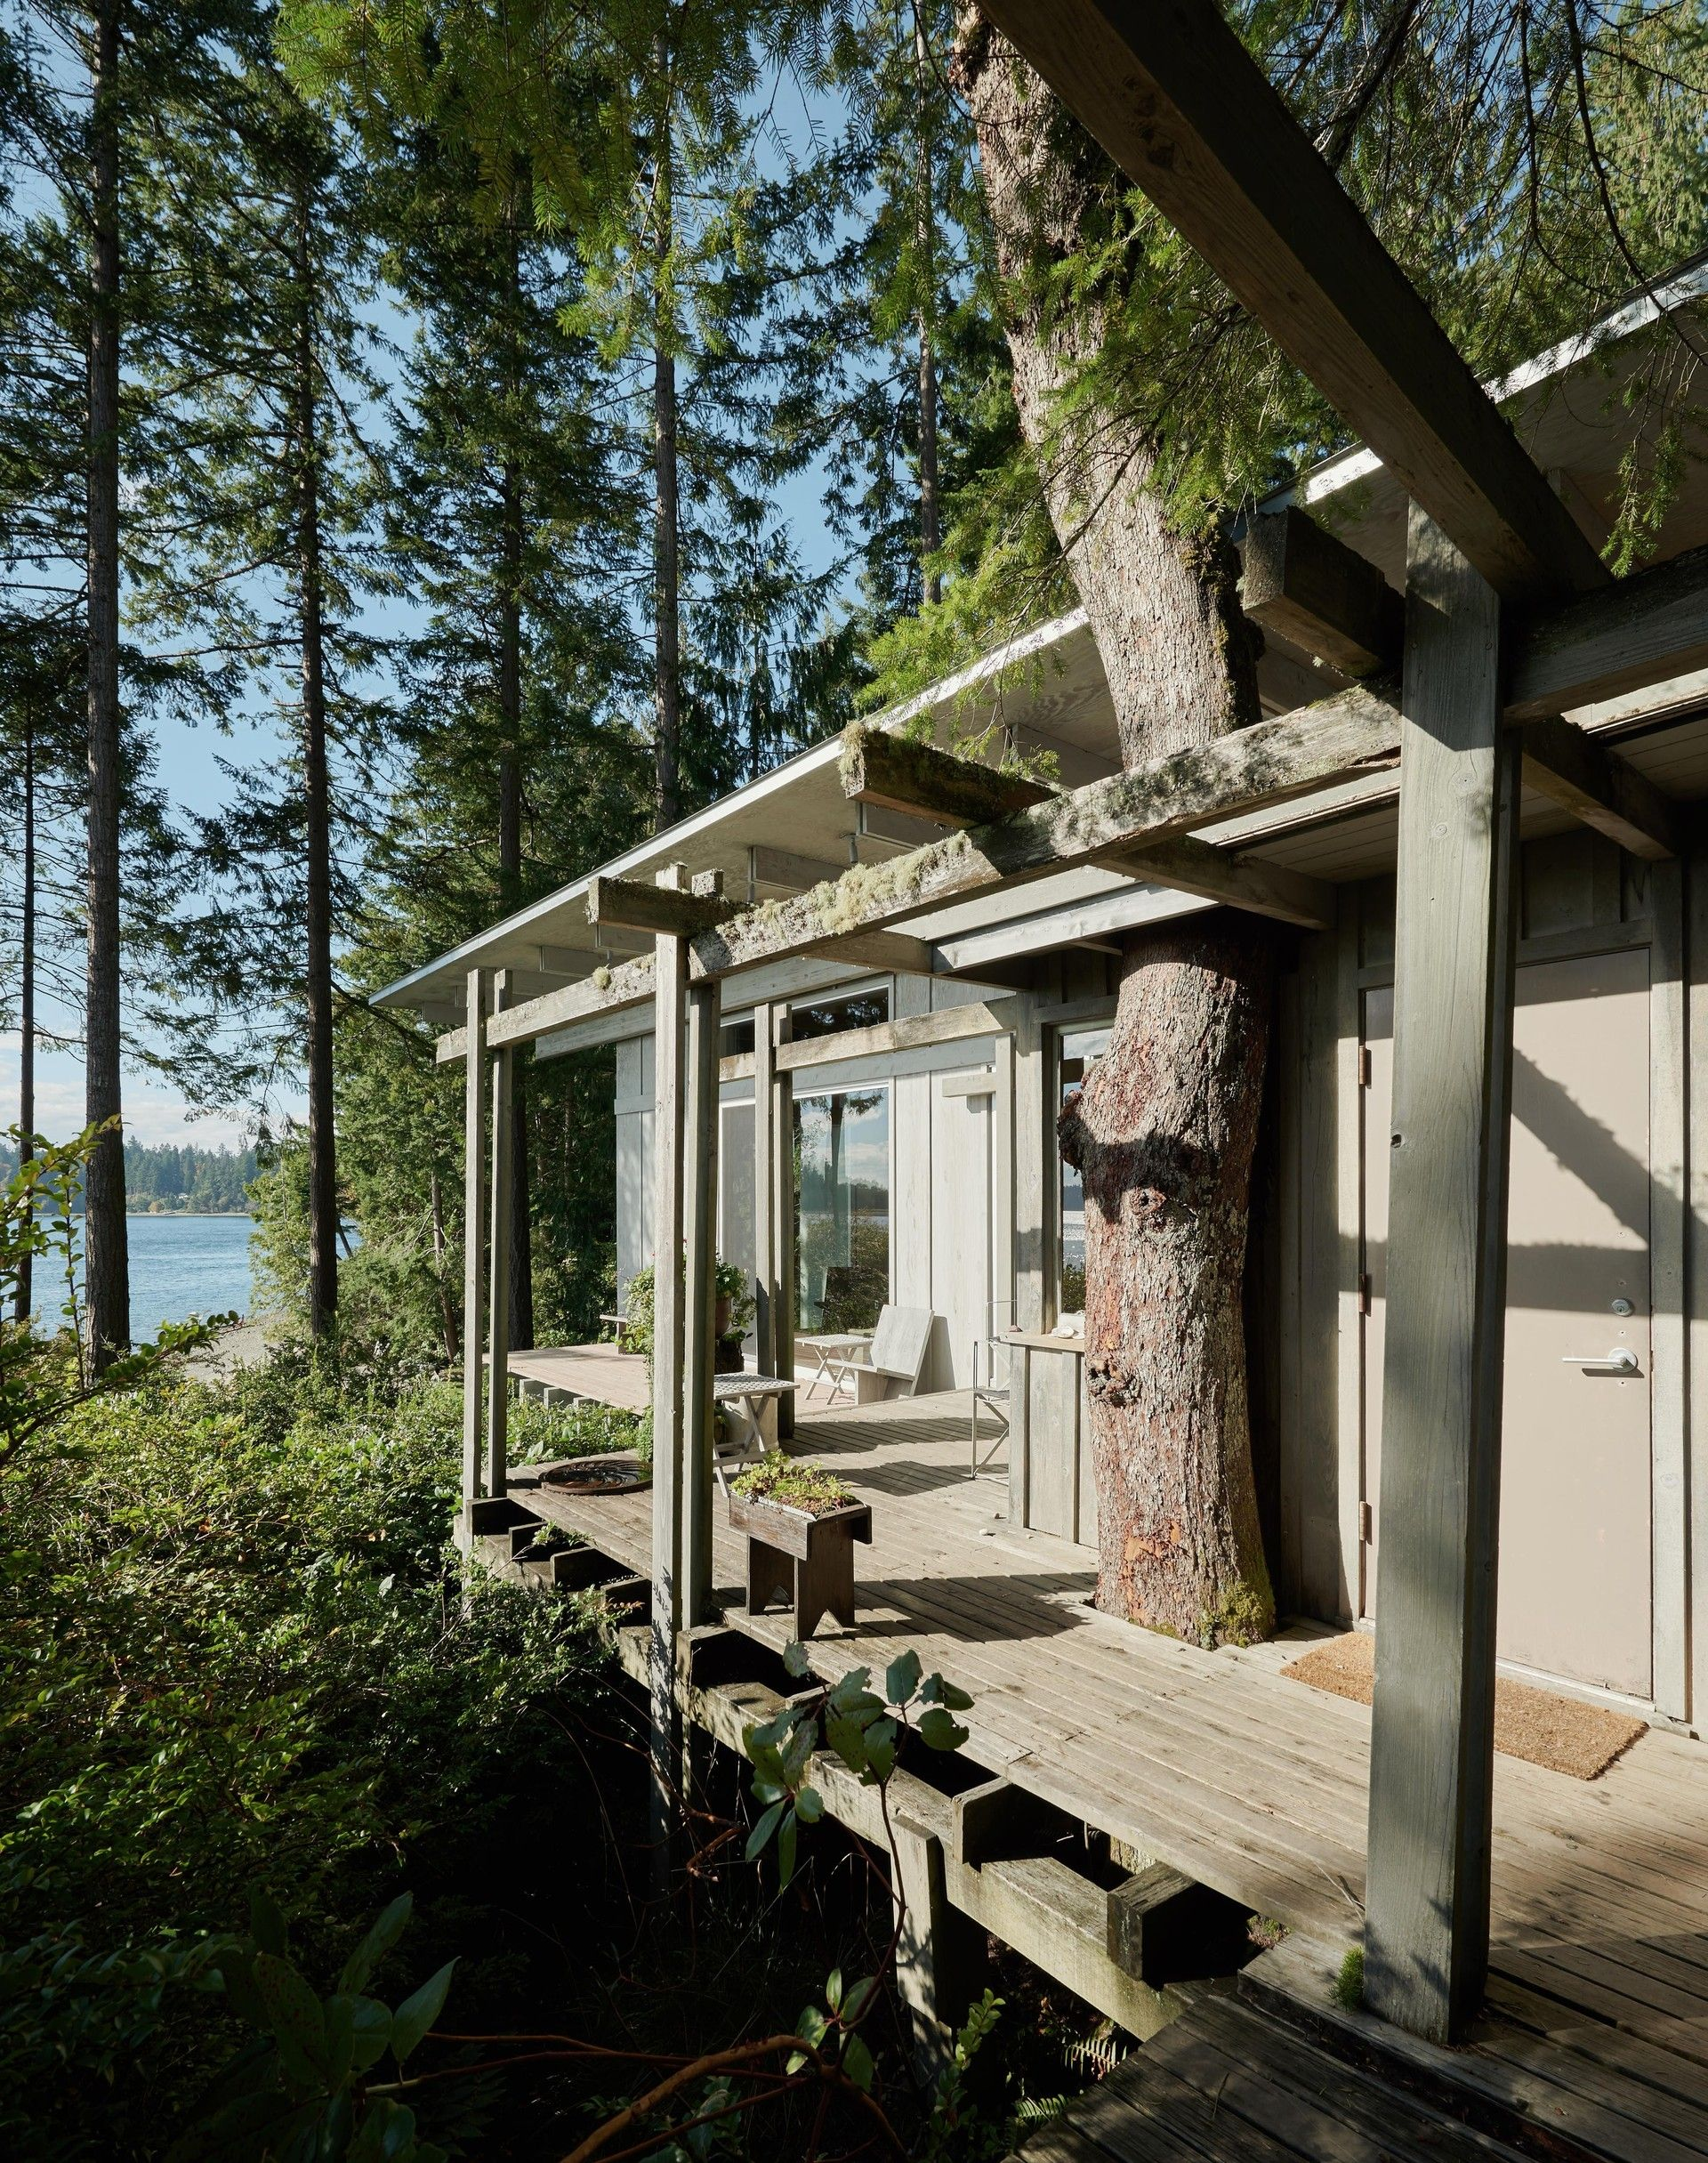 cabin ohio haven lake vacation hemlock com cabins rentals fall tophillcabins seneca at